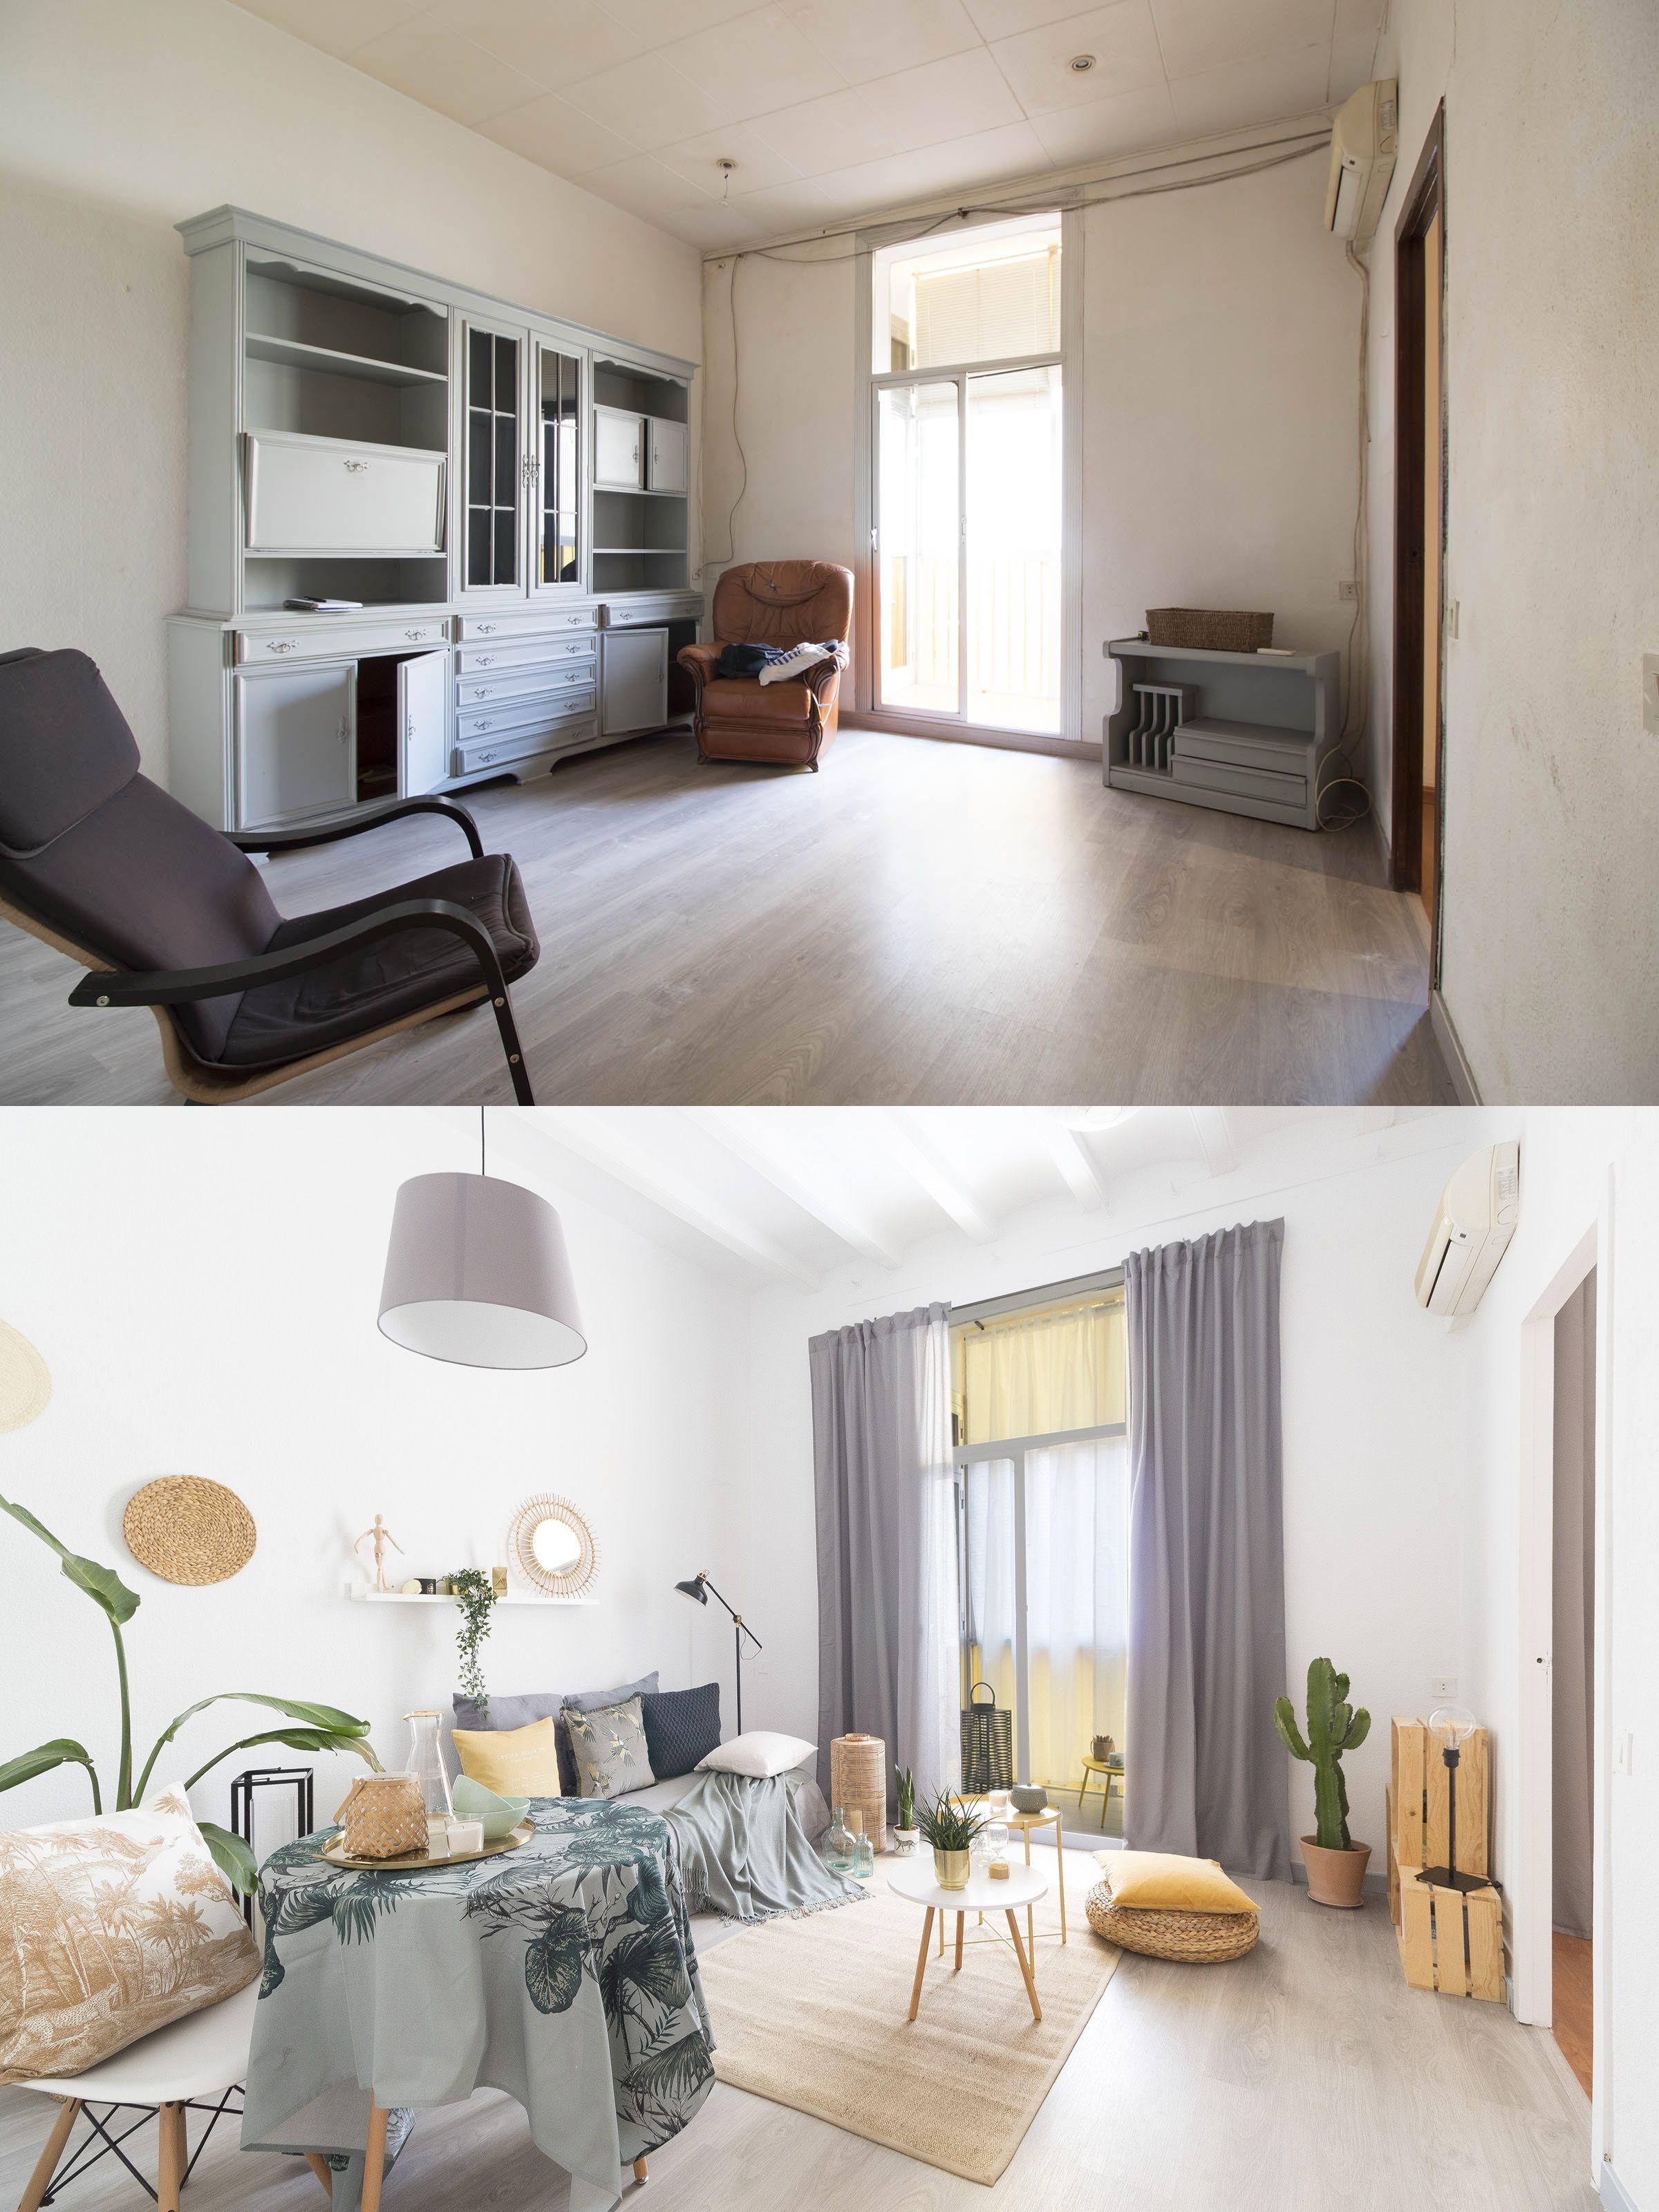 Home Staging antes y después Barcelona Home staging